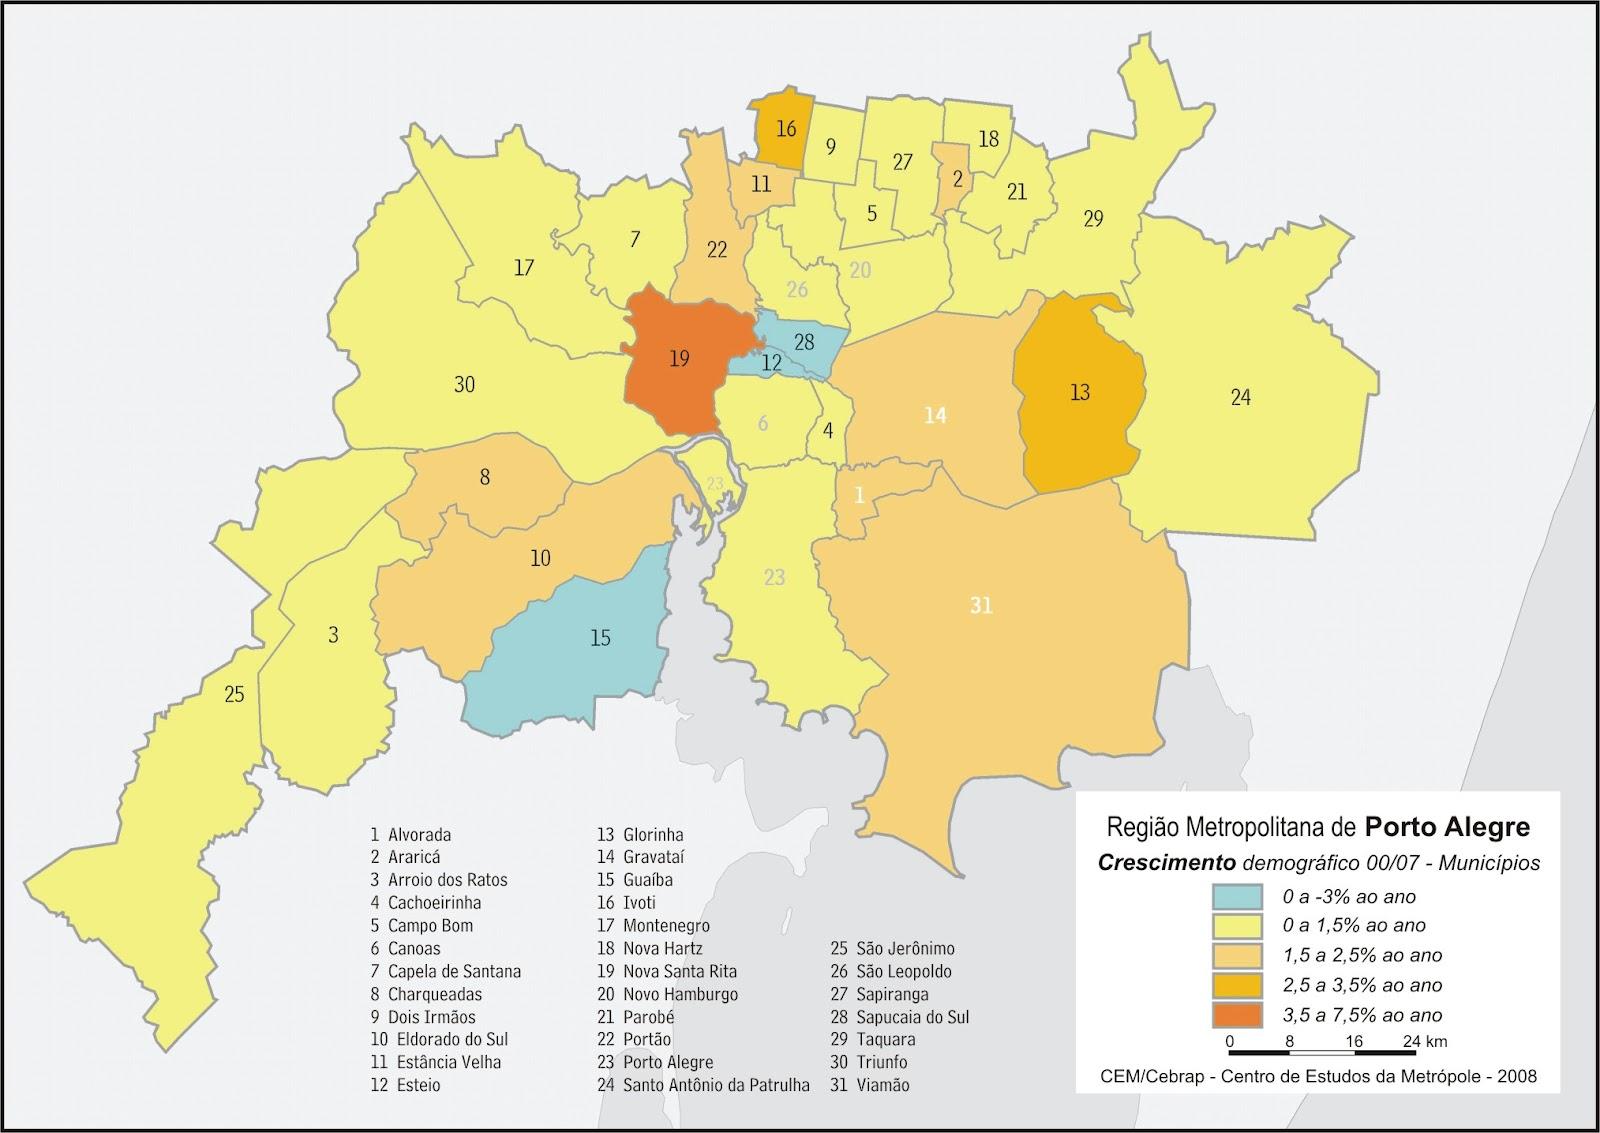 mapa do grande porto Grande Porto Alegre: MAPAS: Crescimento demográfico na Grande  mapa do grande porto